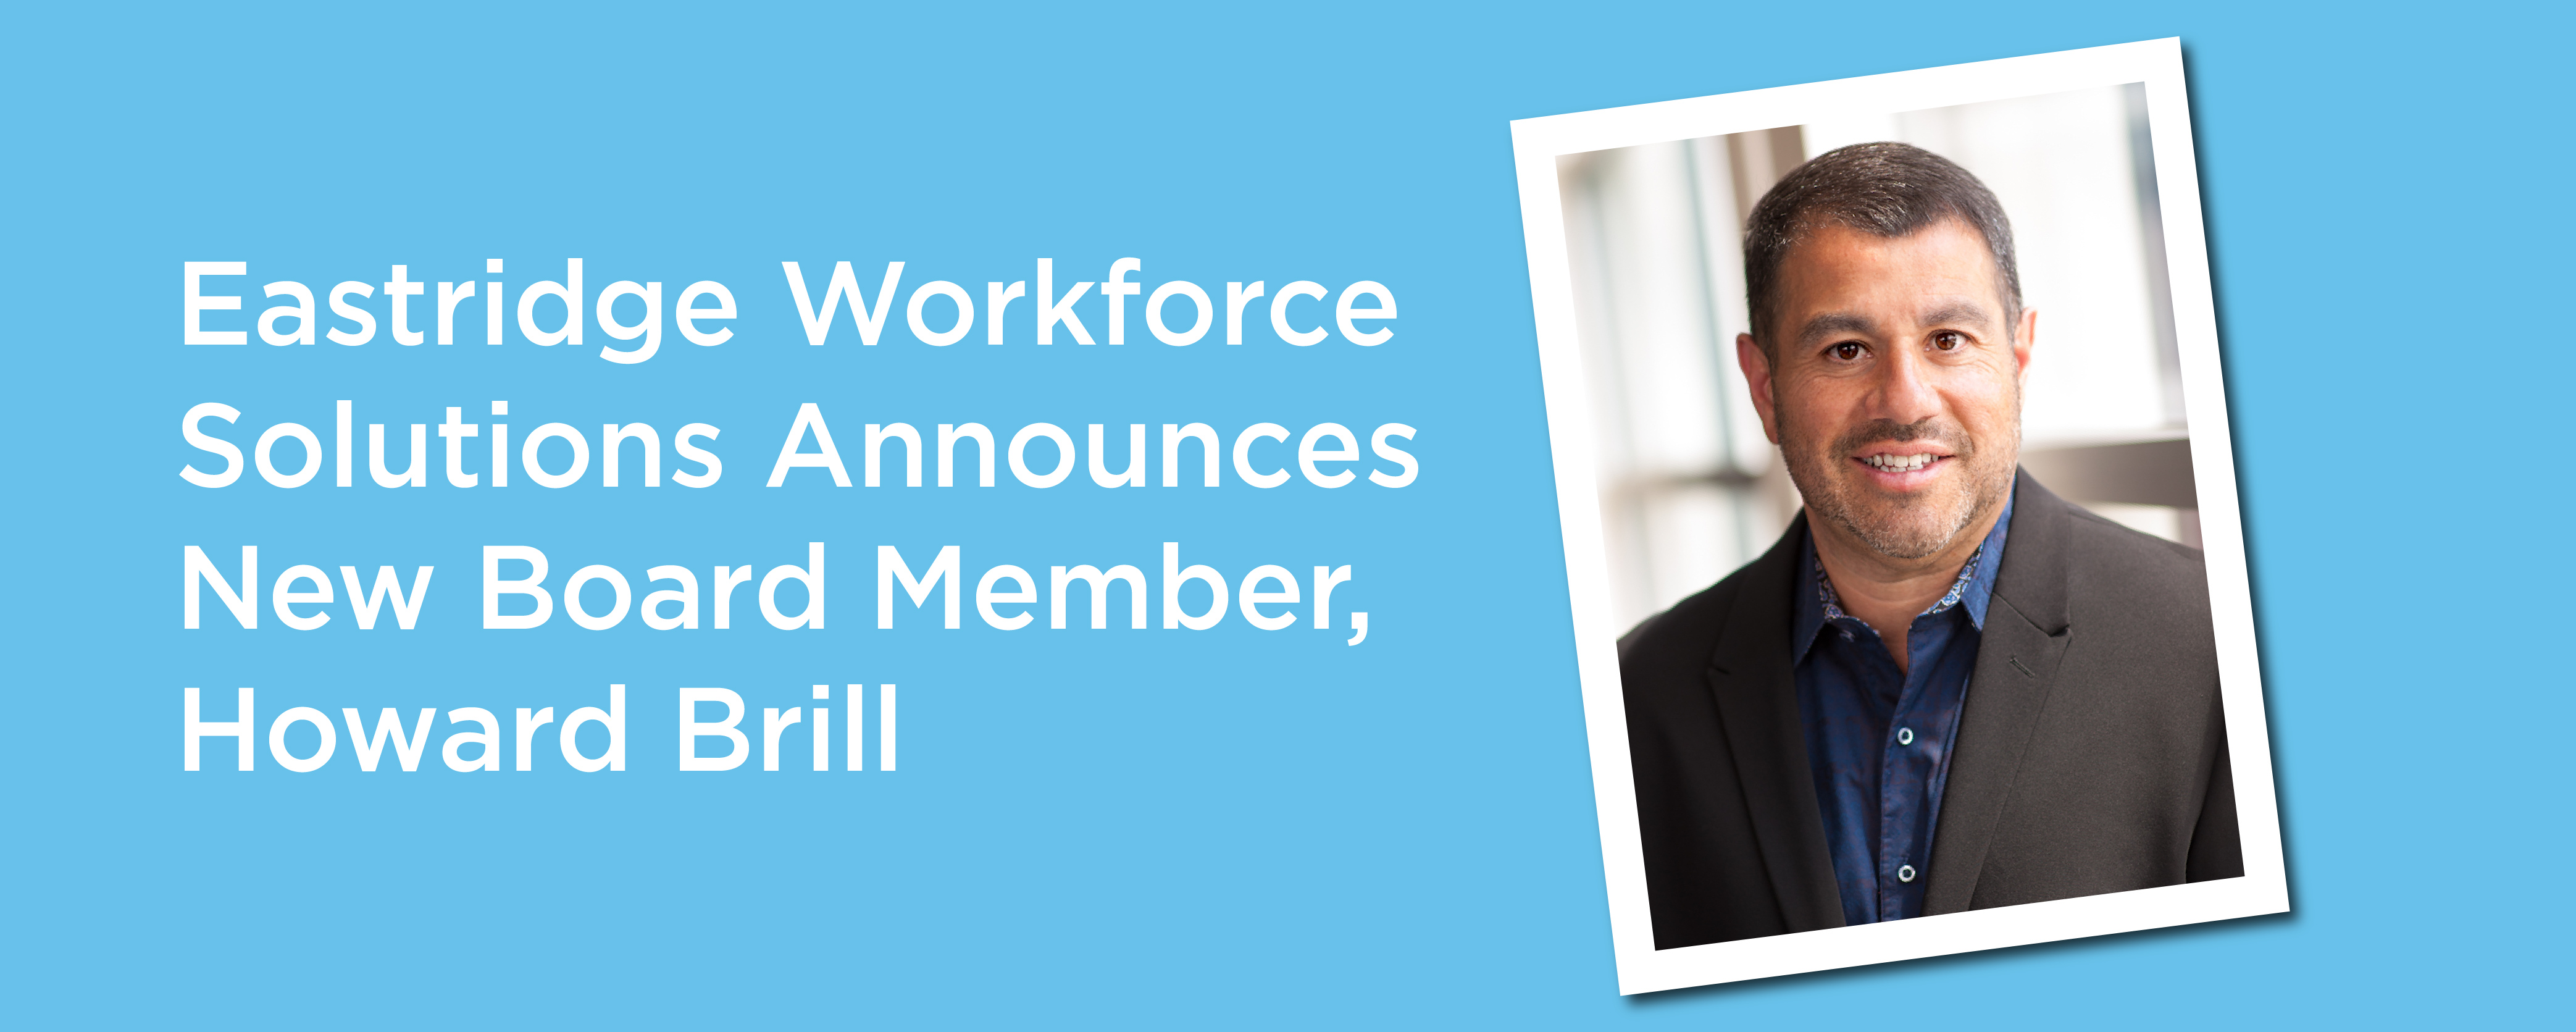 eastridge workforce solutions announces new board member howard brill